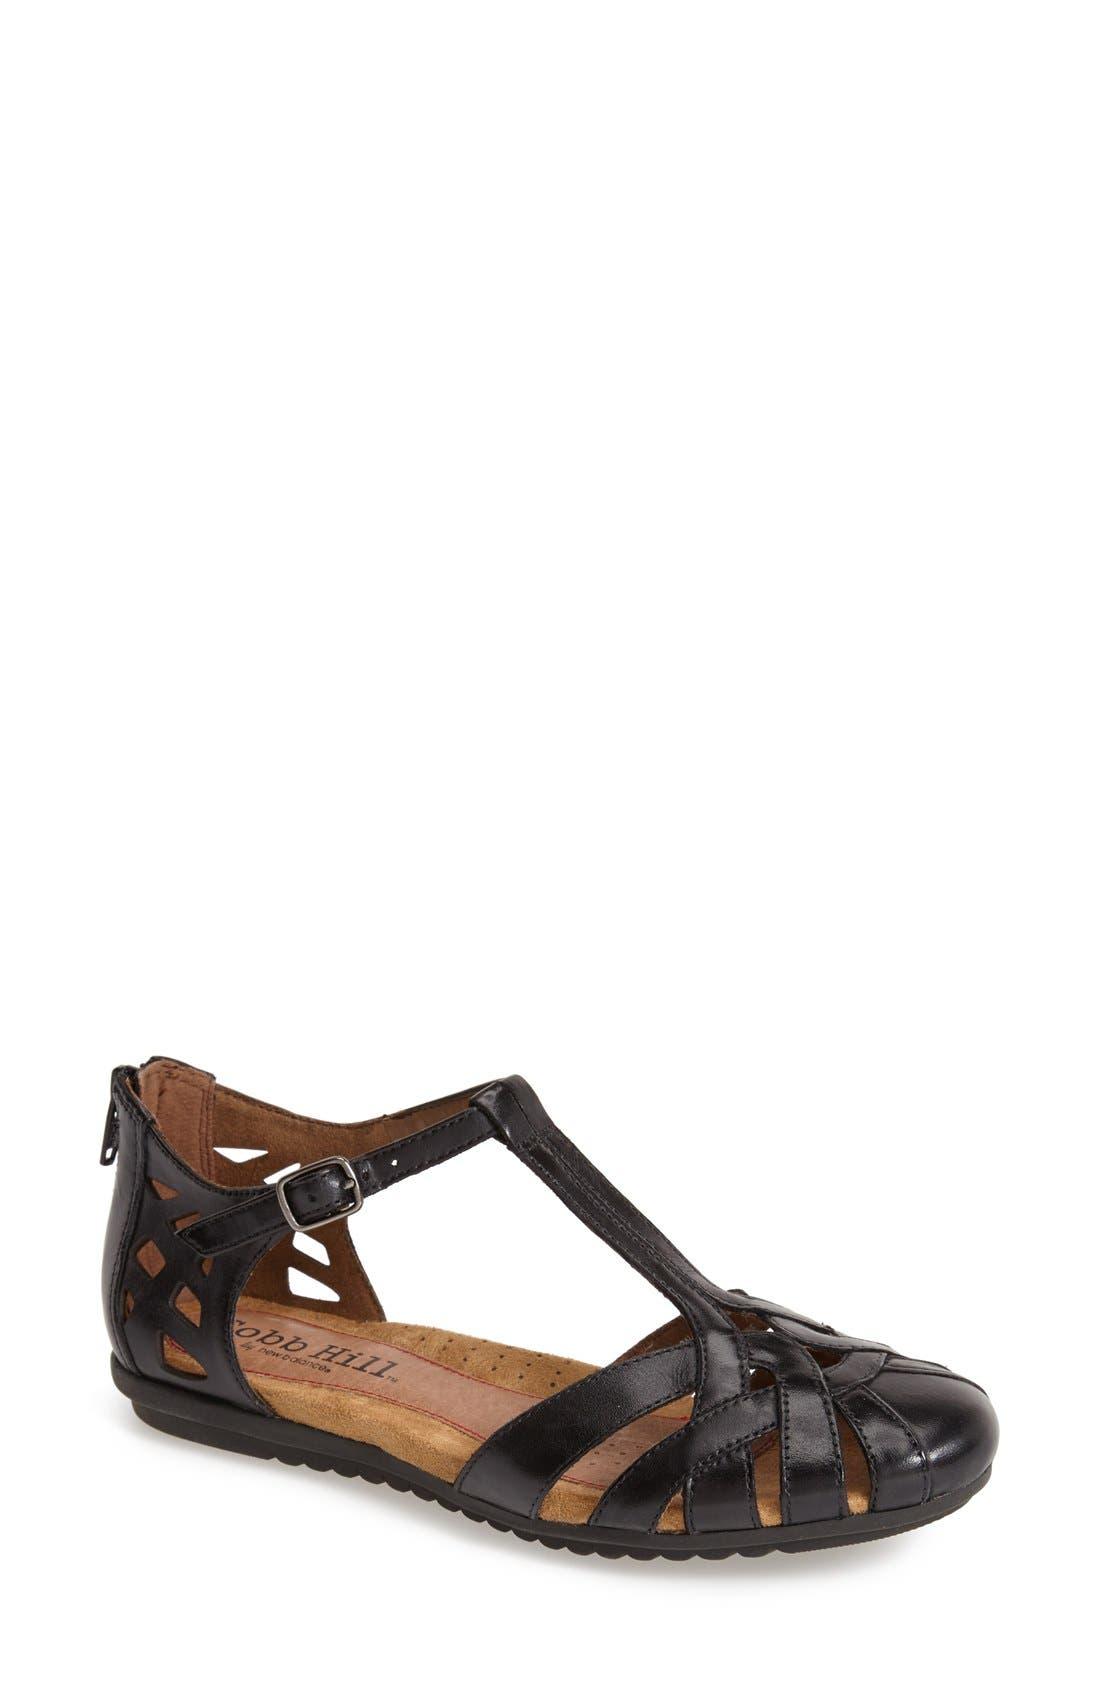 ROCKPORT COBB HILL 'Ireland' Leather Sandal, Main, color, BLACK